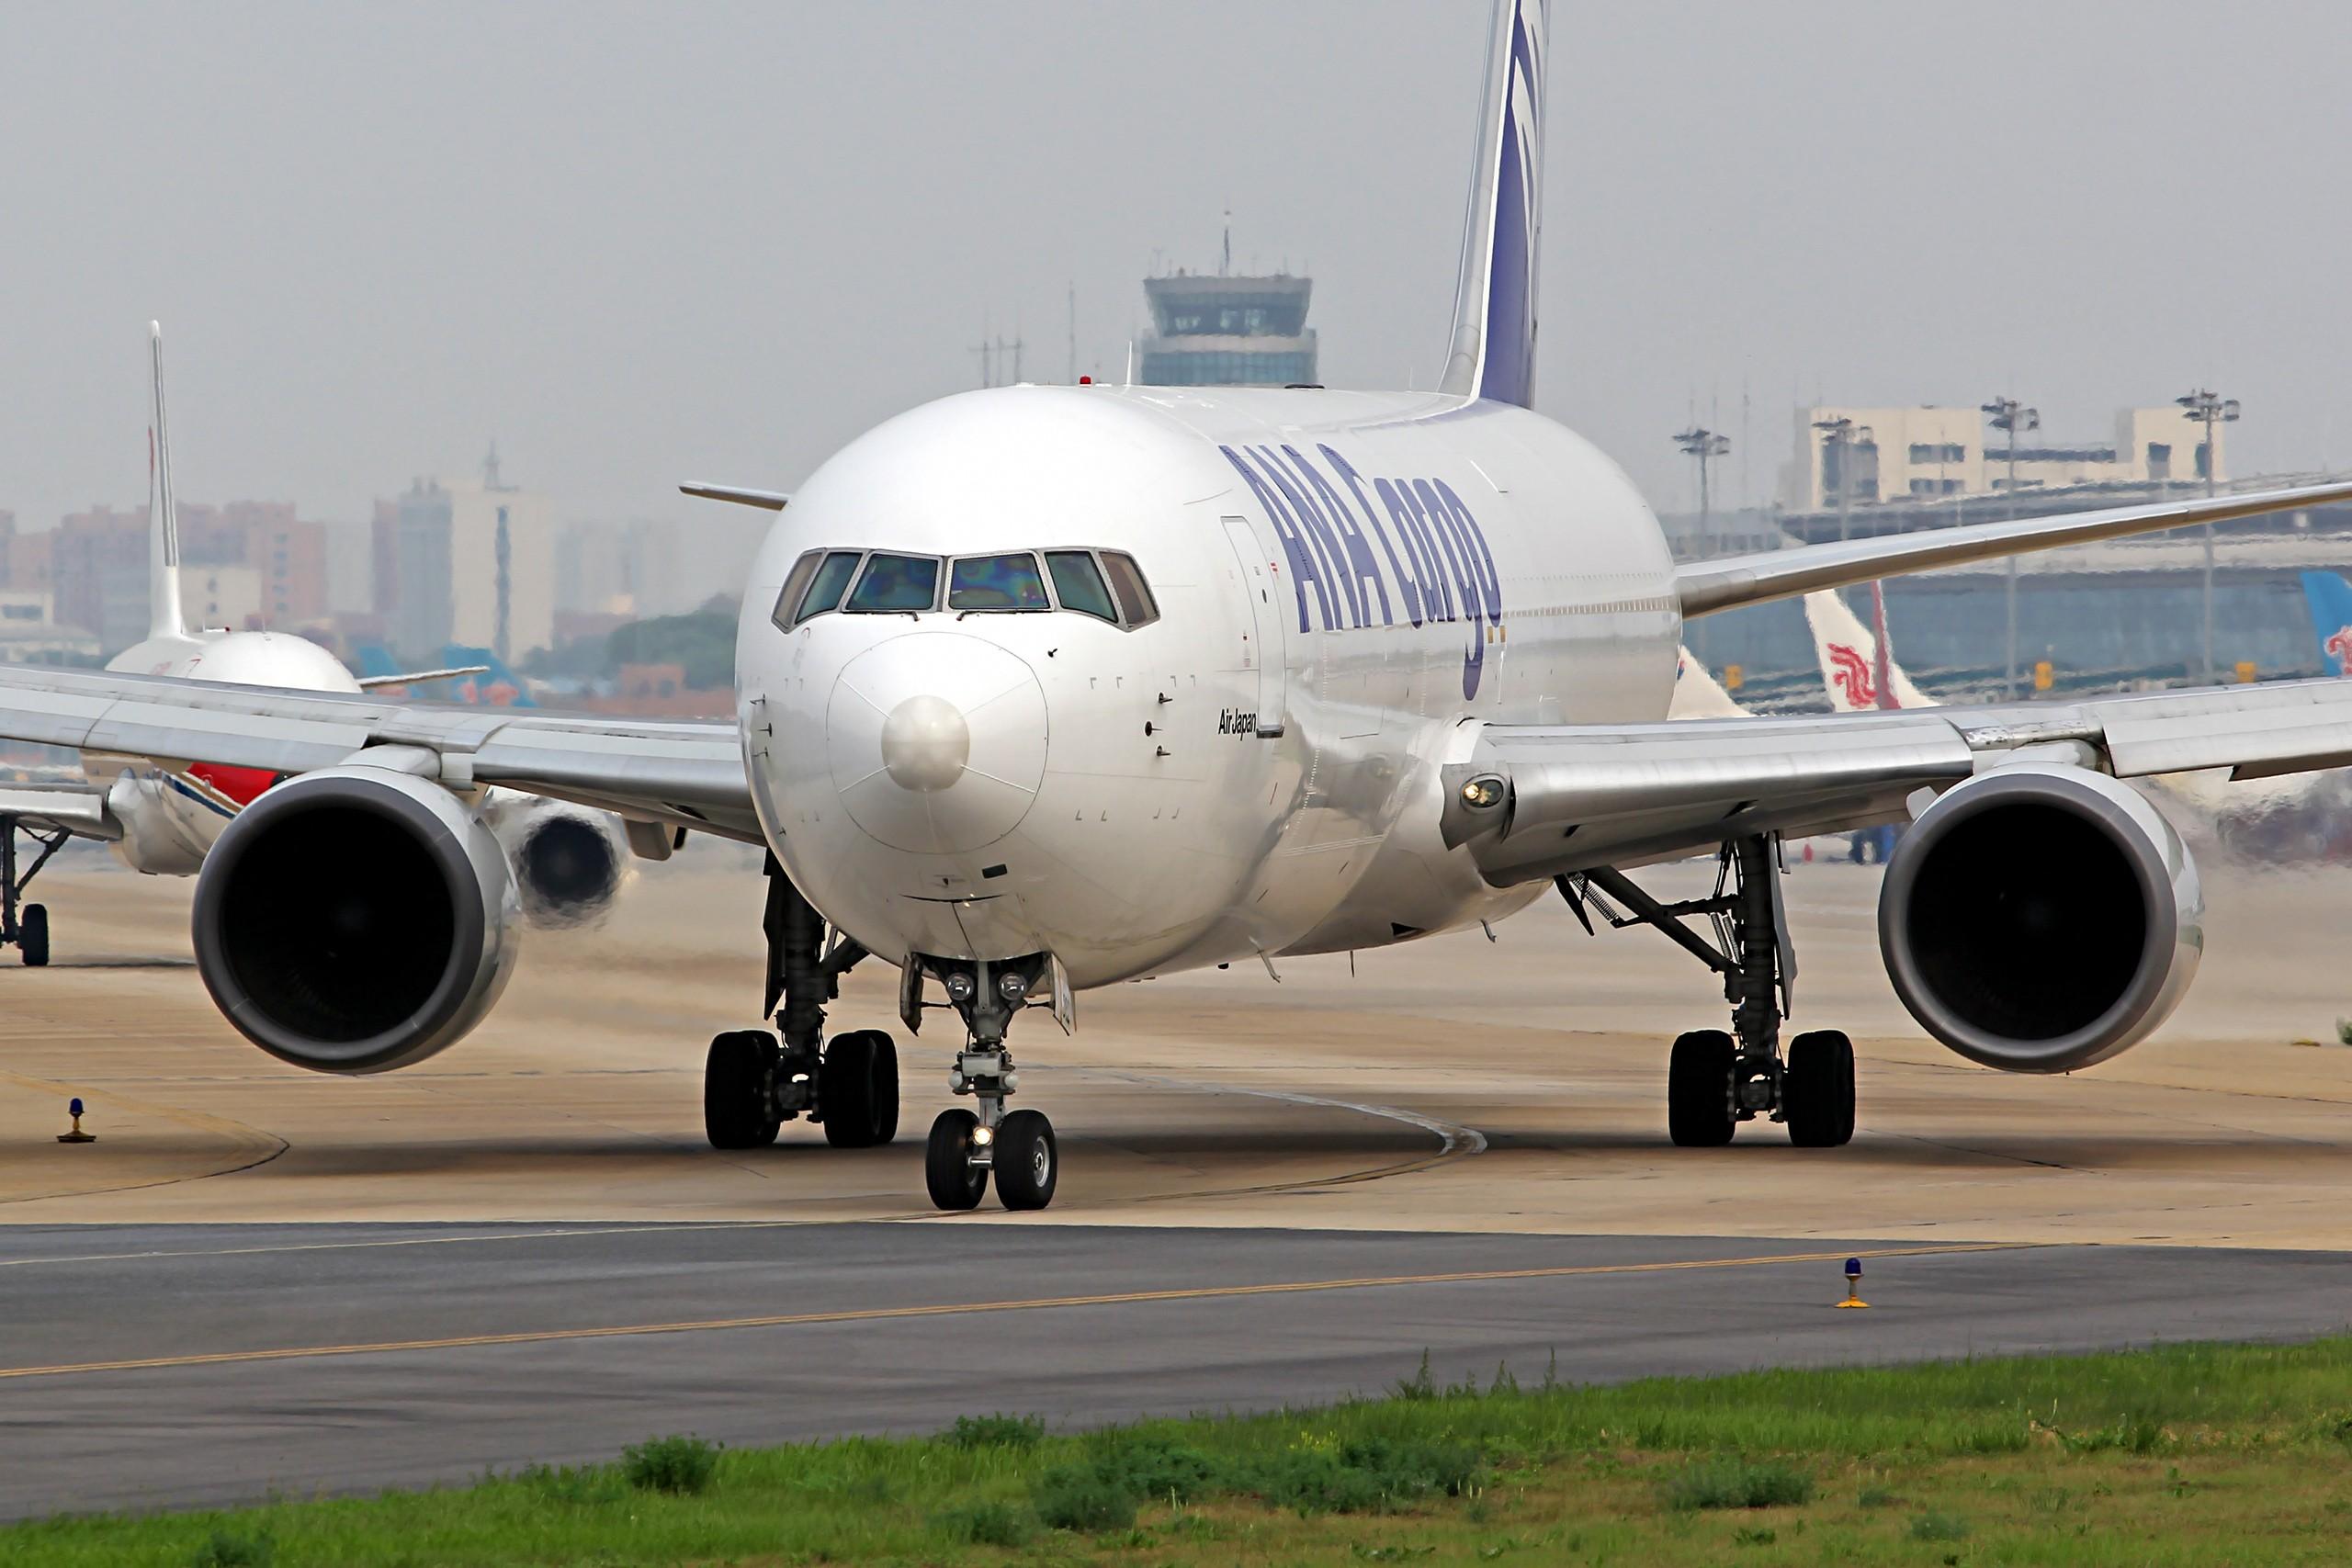 Re:[原创][DLC]2560x1707Pix BOEING 767-300 JA8362 中国大连周水子国际机场